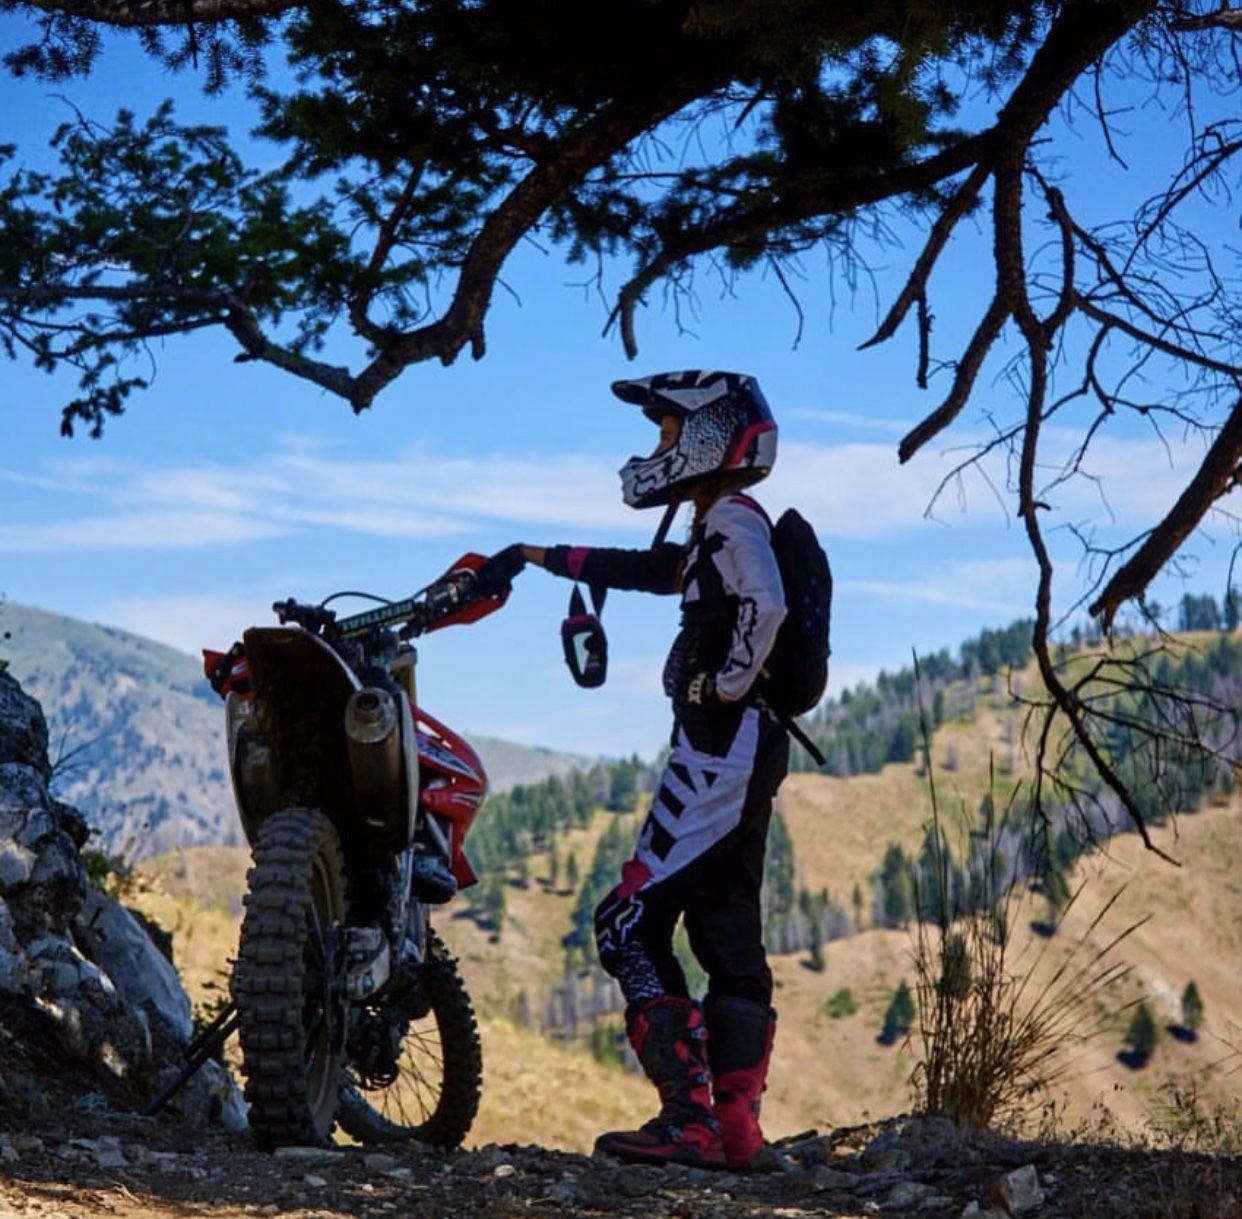 Families that ride together… Idaho Enduro